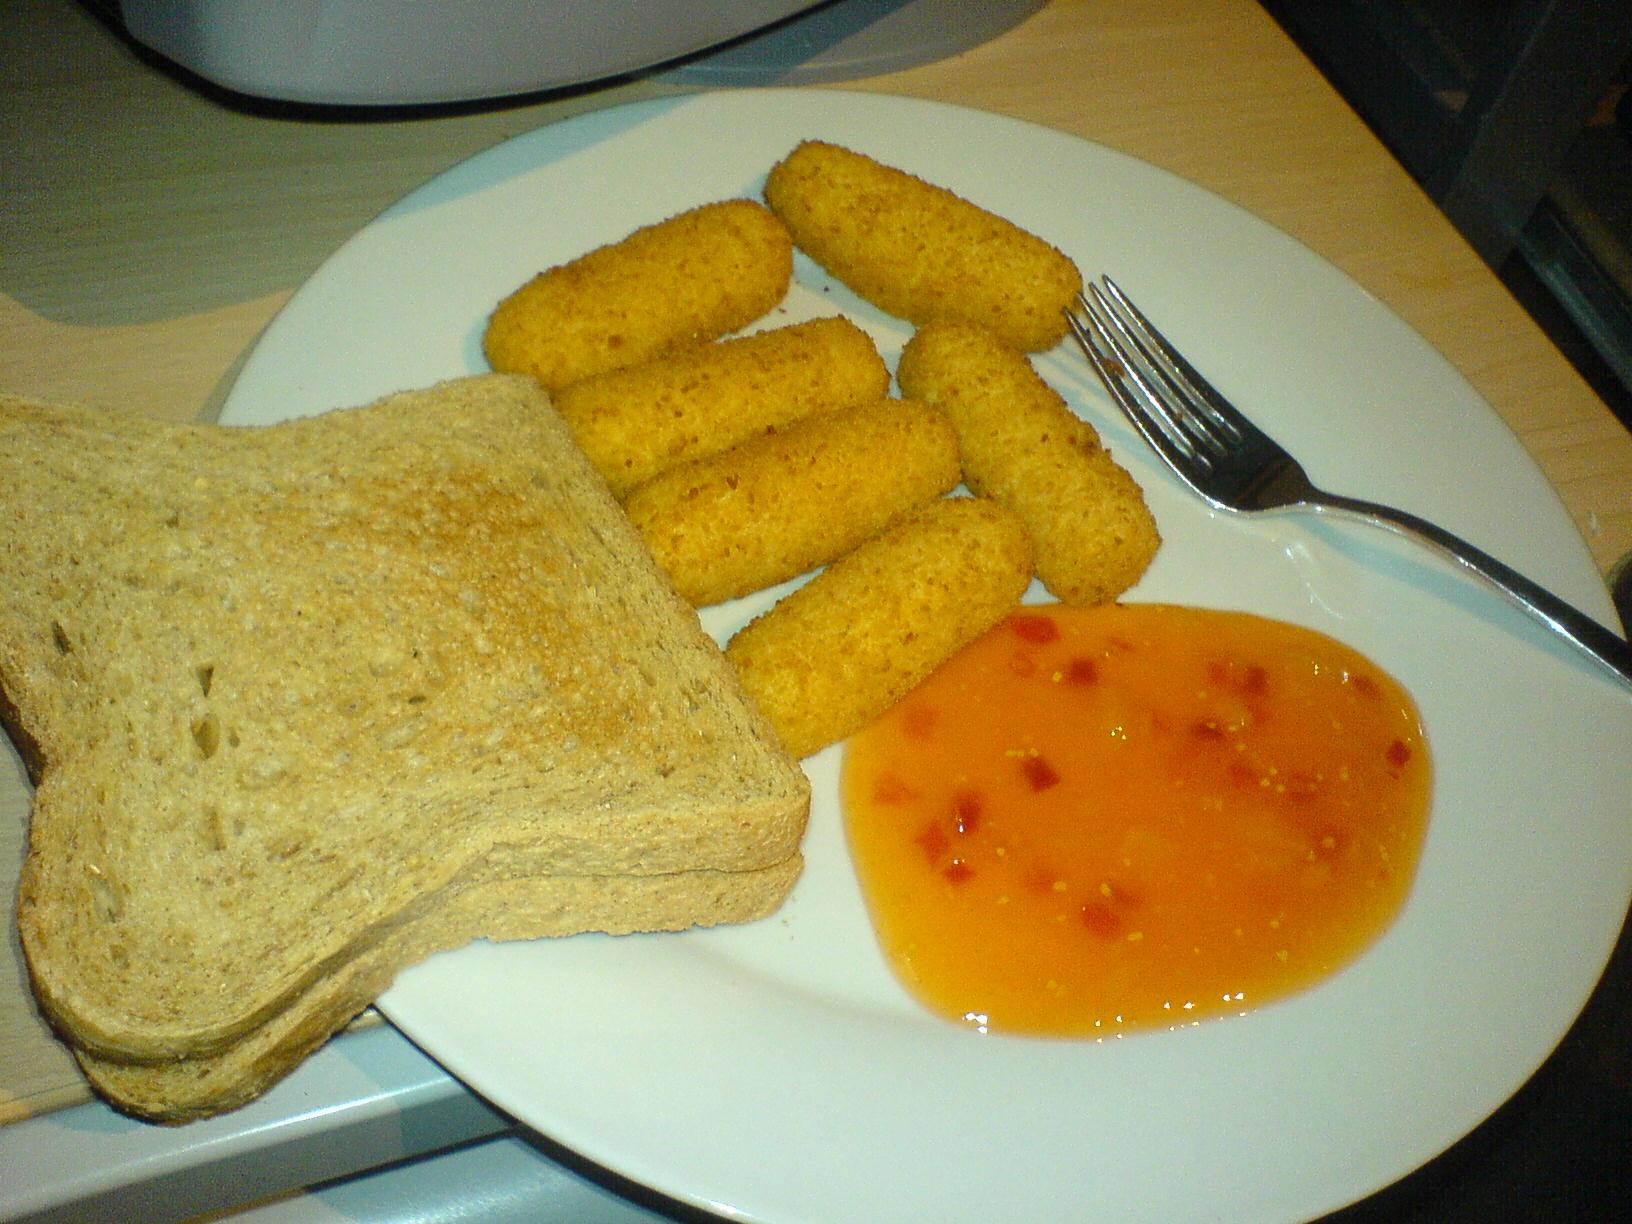 http://foodloader.net/Holz_2009-02-03_Frischkaese-Sticks_mit_Toasts.jpg